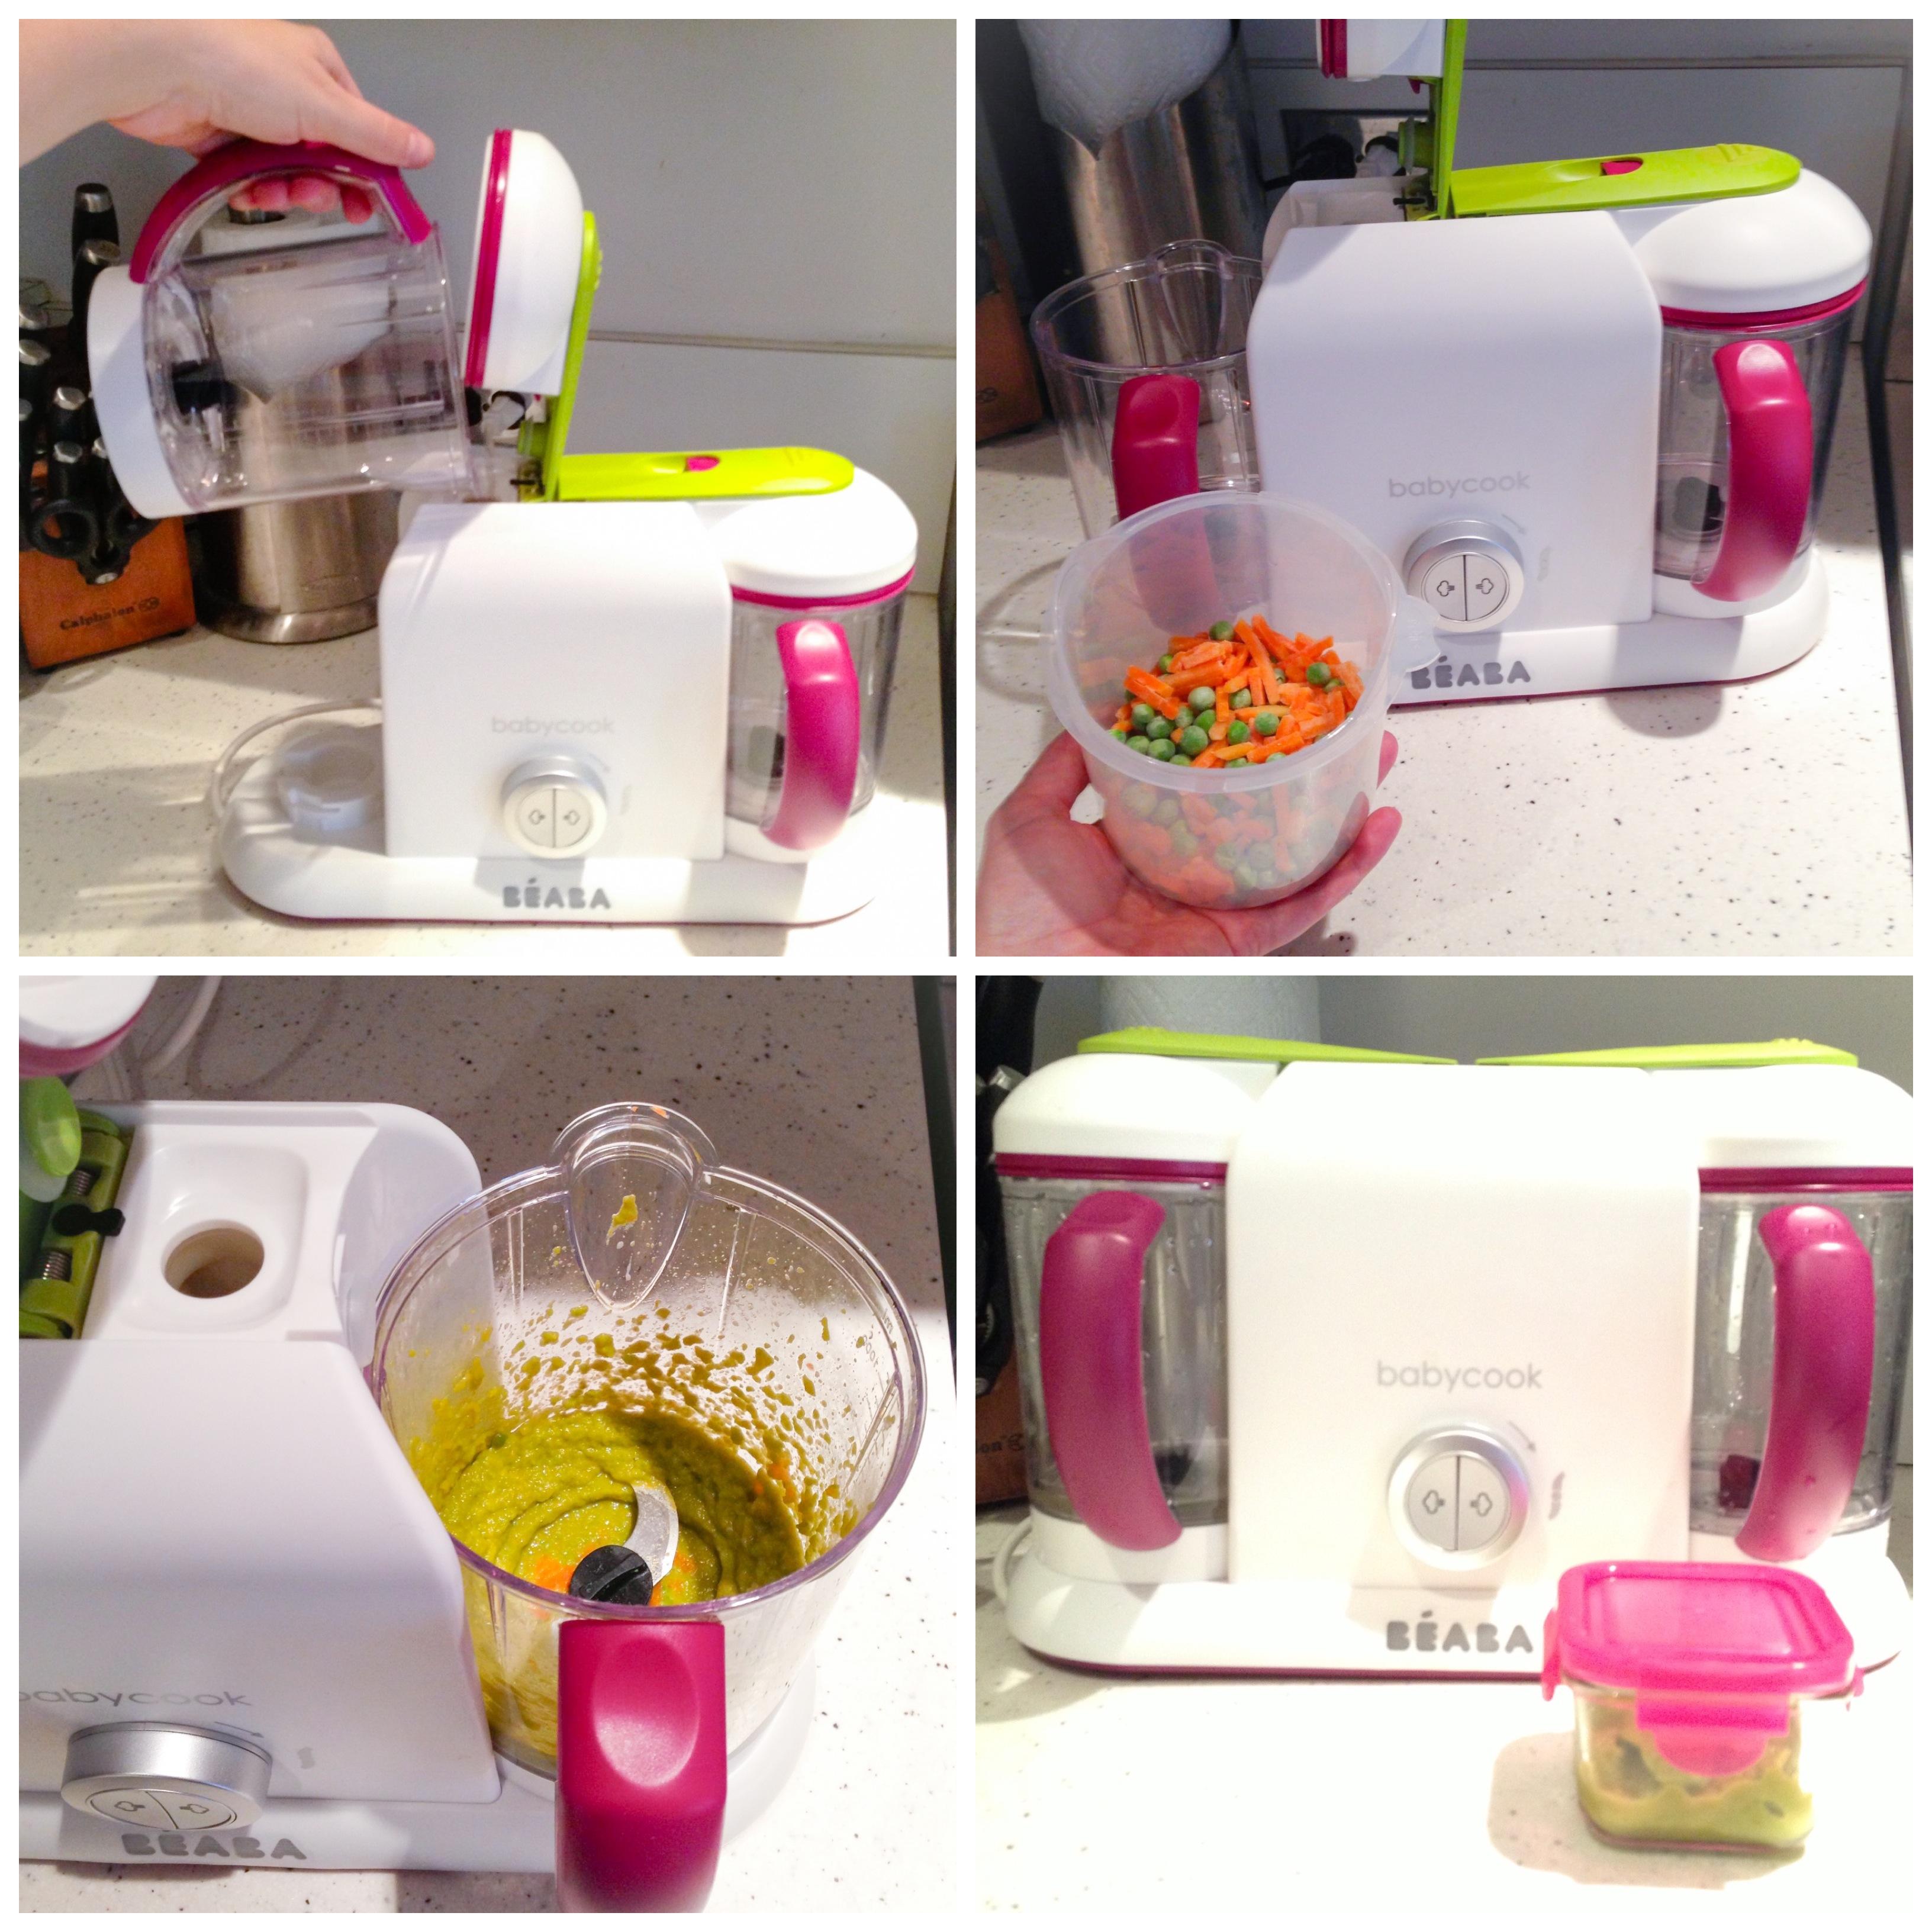 Beaba Babycook Original  In Baby Food Processor